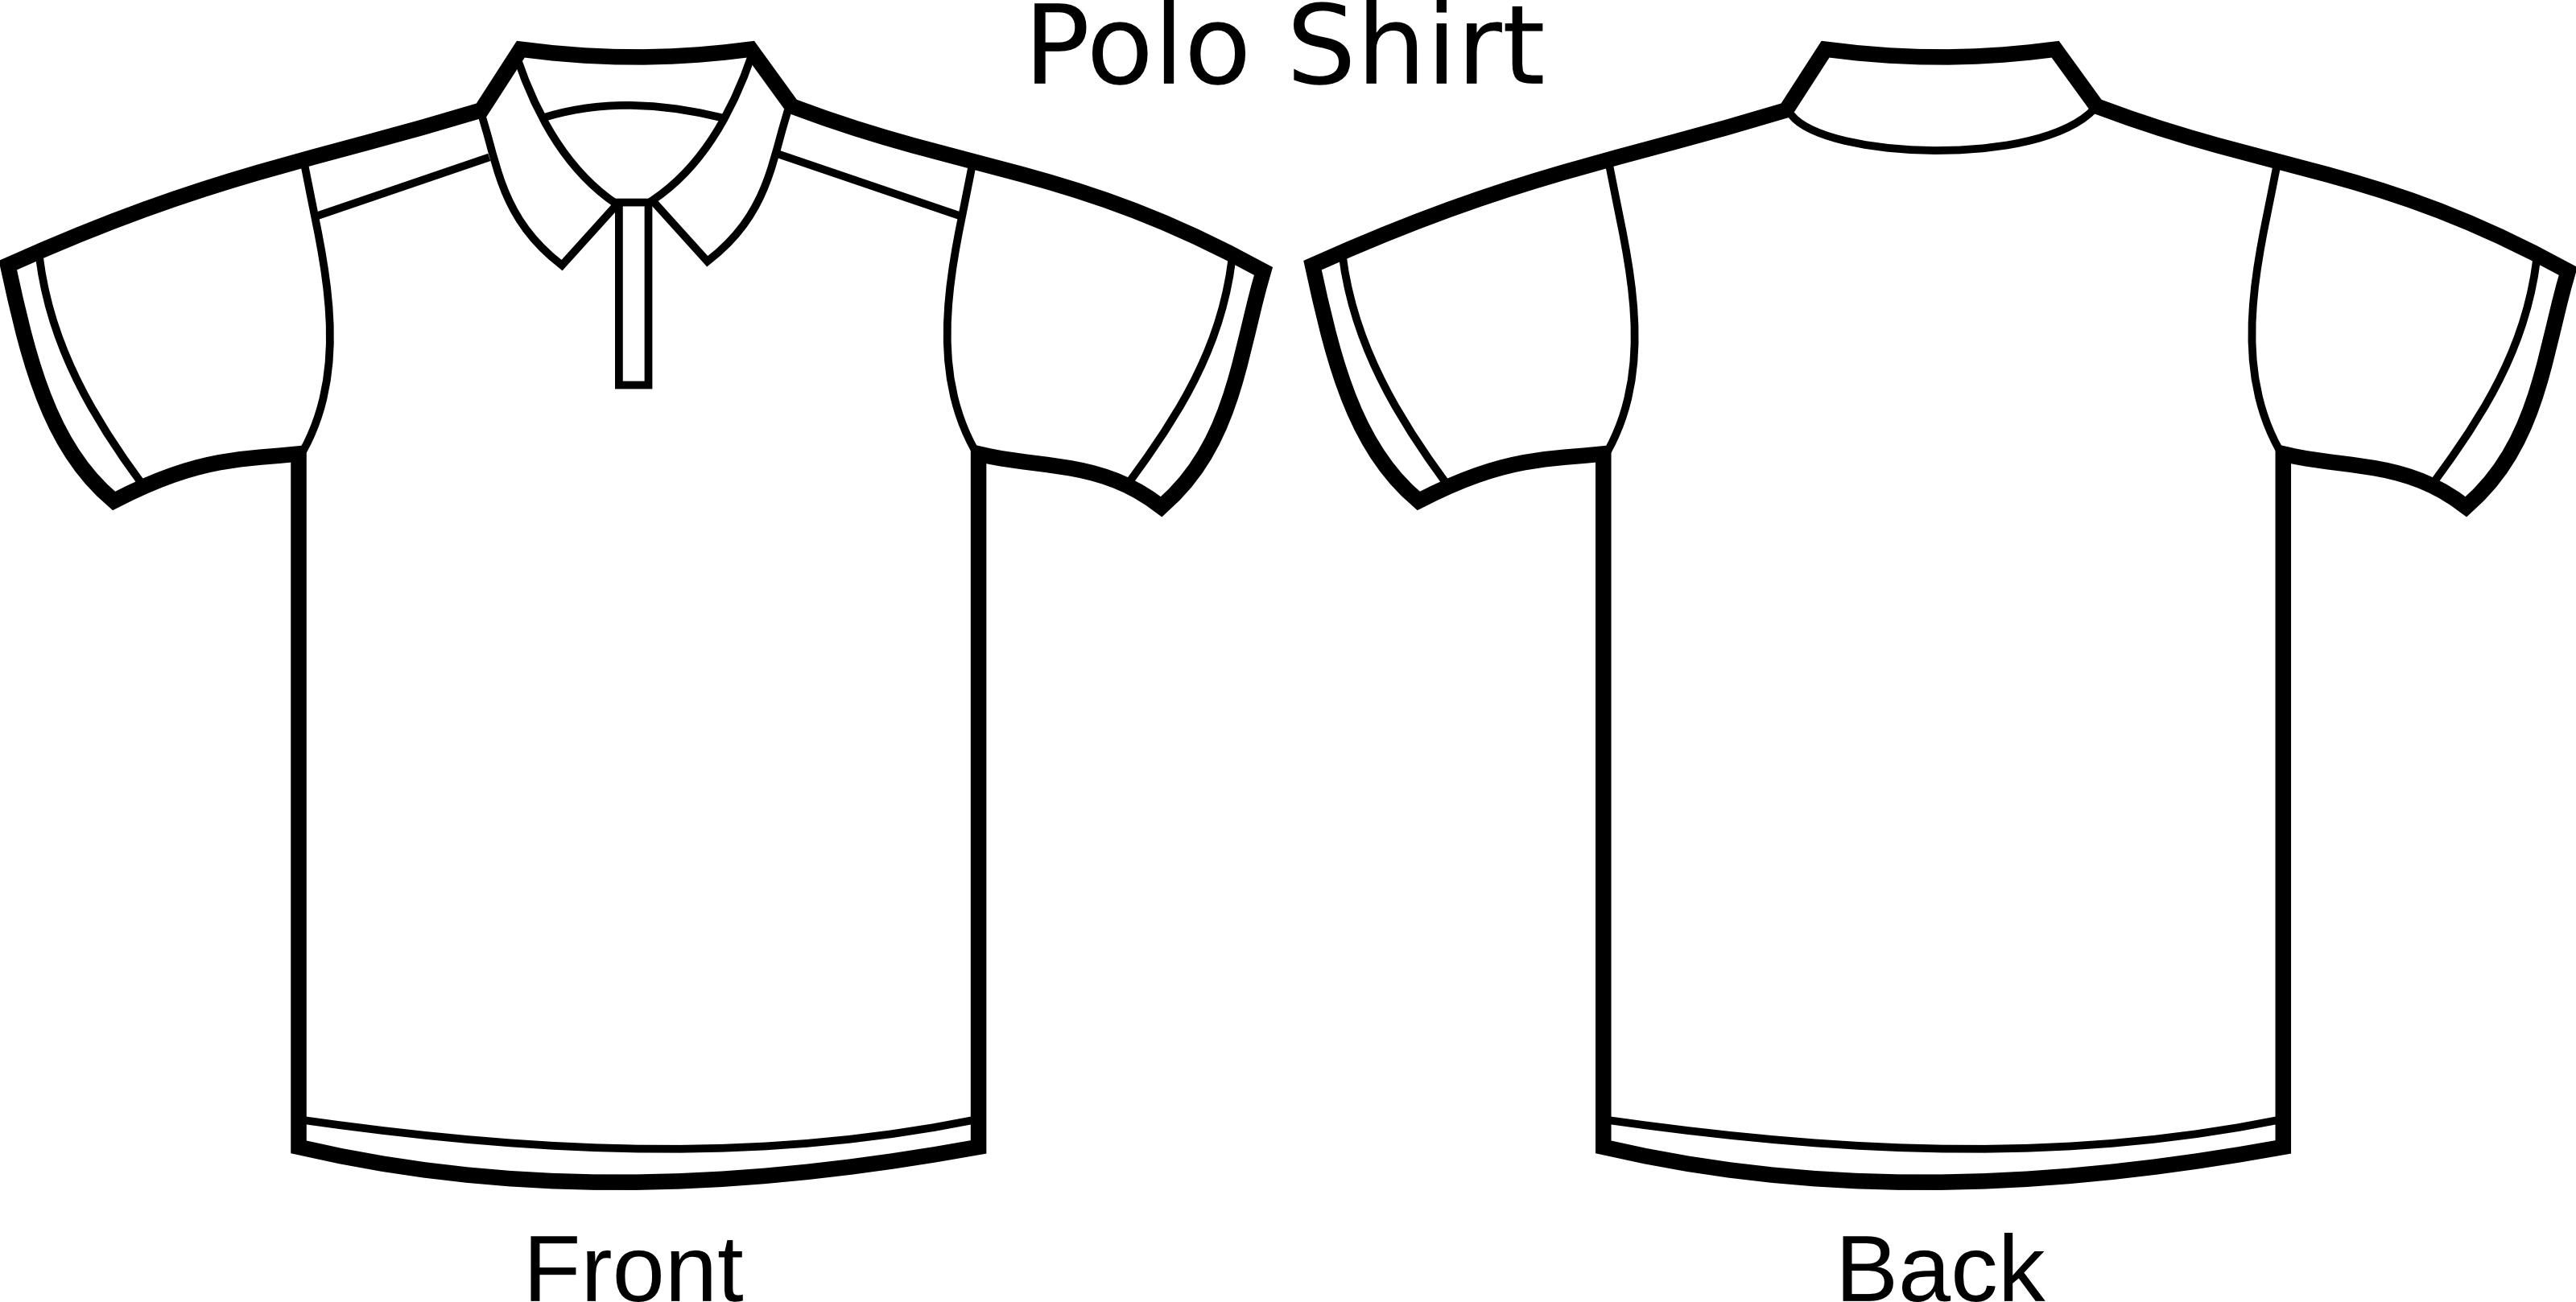 Dark Blue clipart polo shirt Polo & Voila Talk to